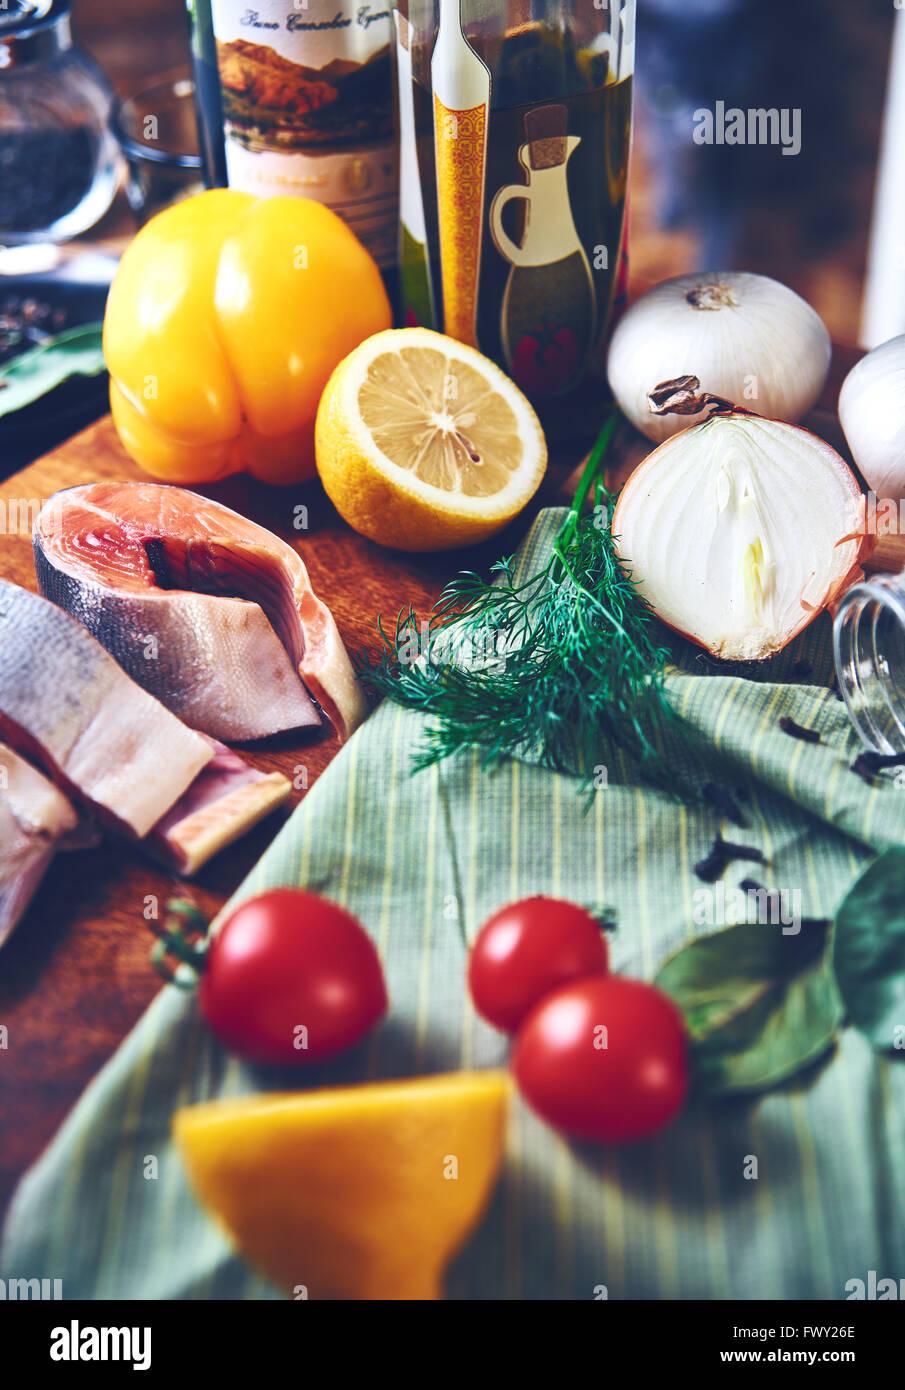 Ancora pesce verdure Immagini Stock